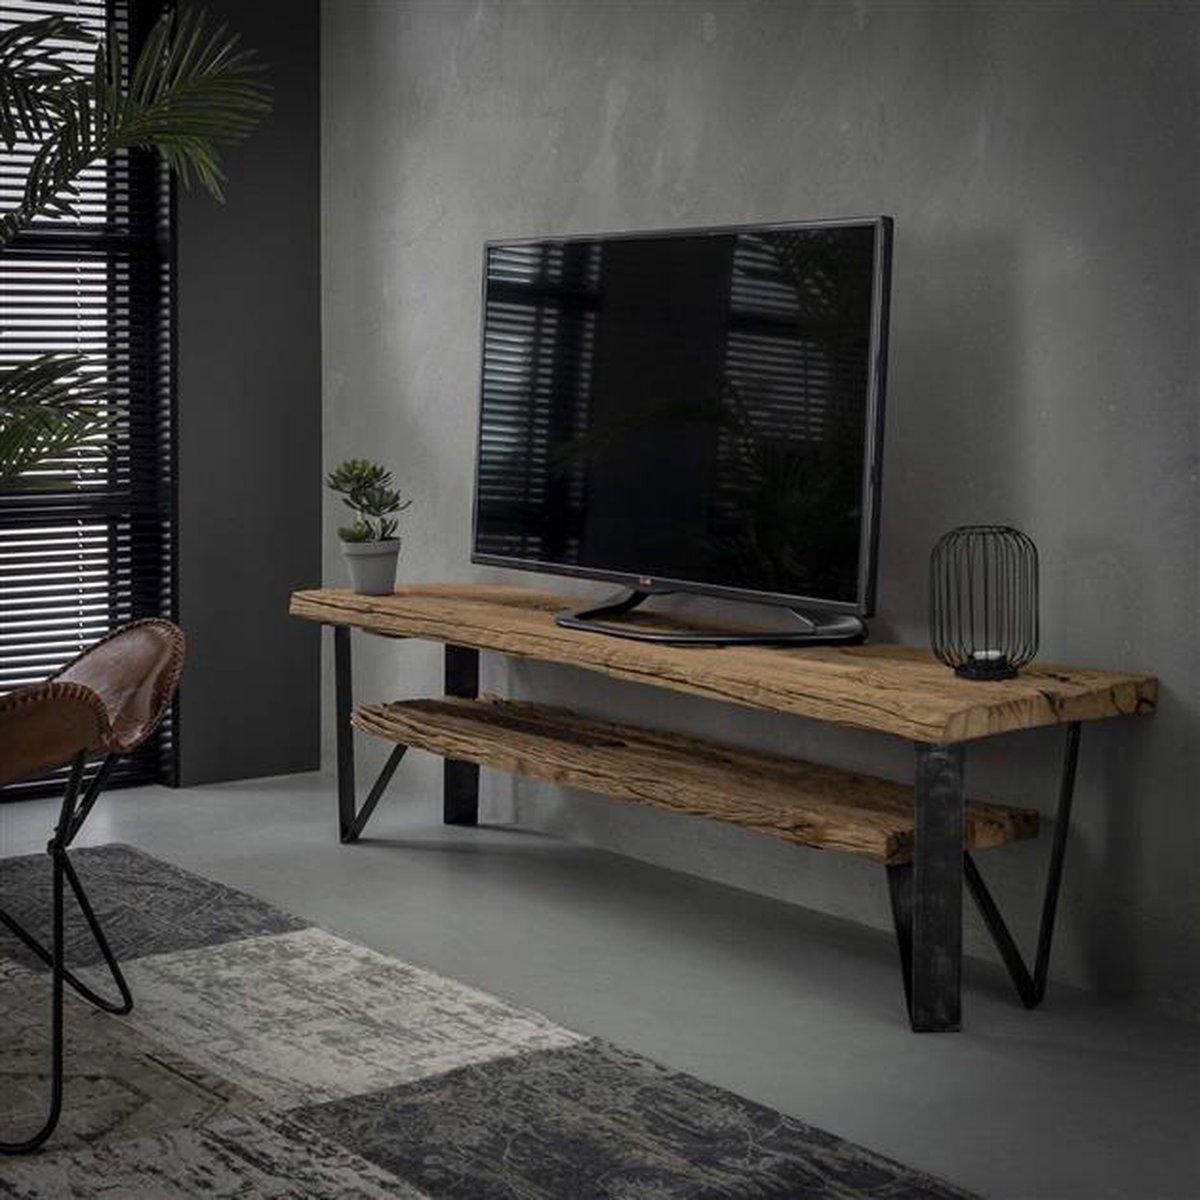 Hardhouten Tv Kast.Bol Com Livin24 Industriele Tv Meubel Nova Hardhout 160x40cm